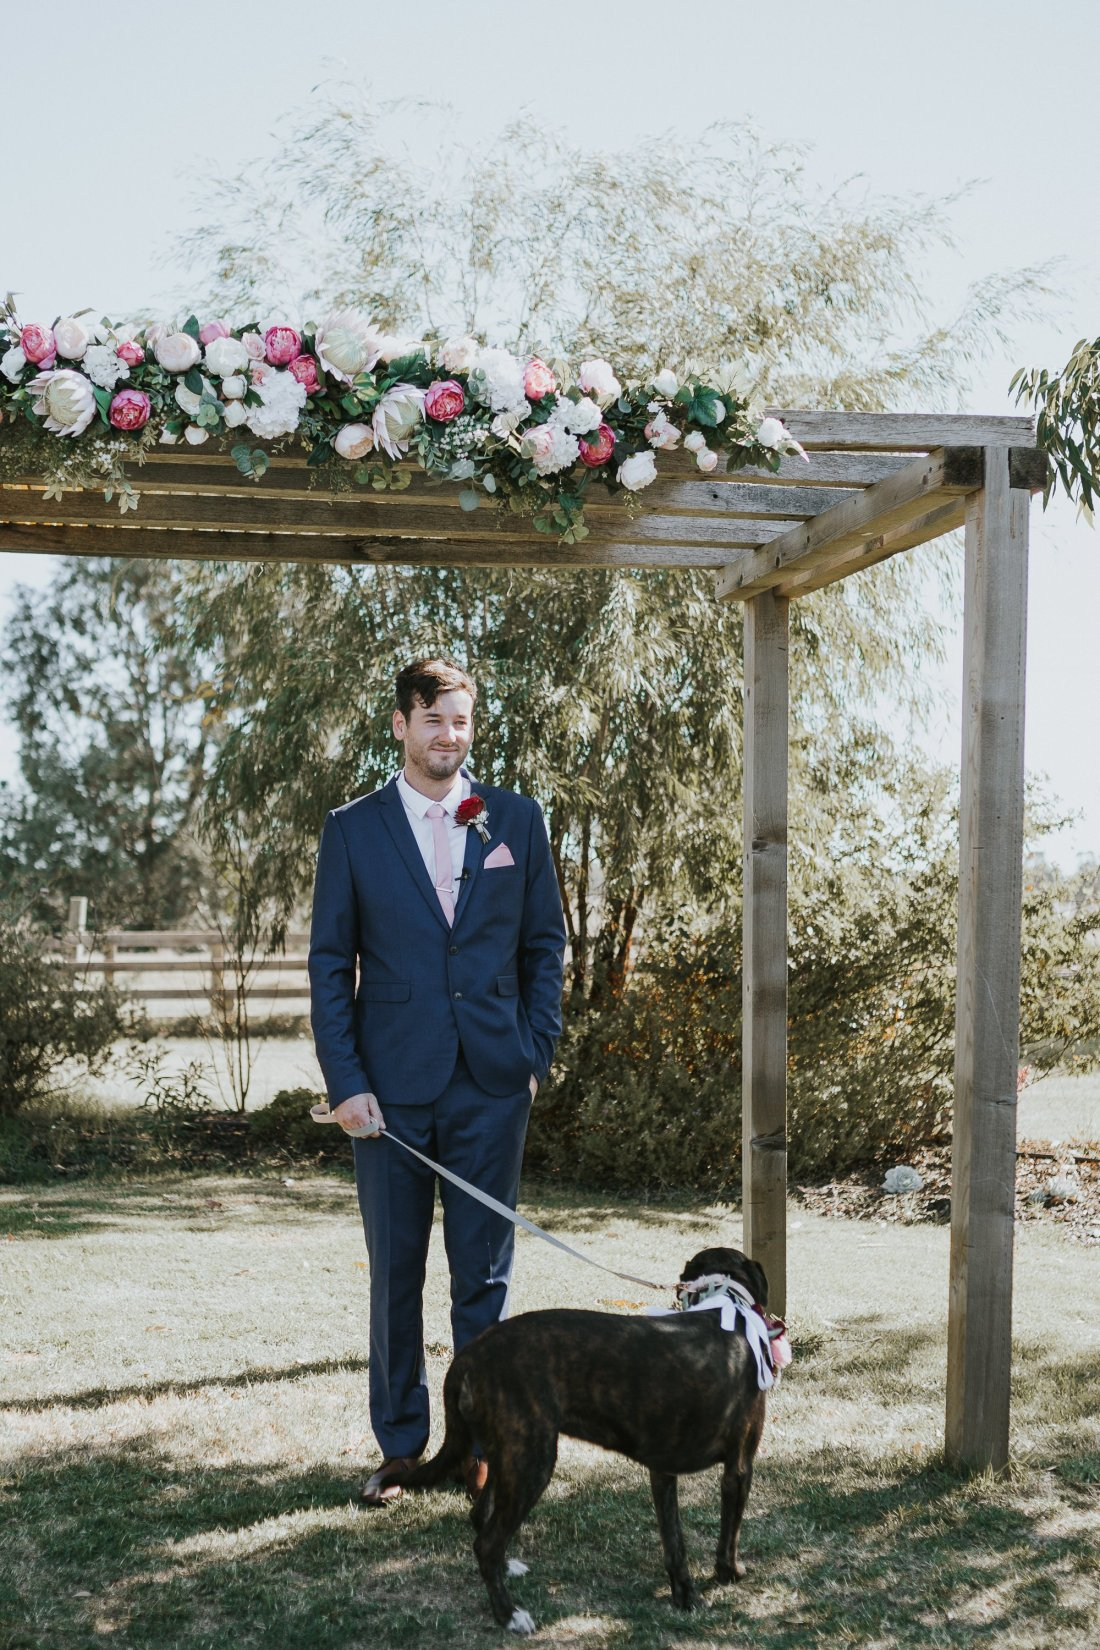 Perth Wedding Photographer | Ebony Blush Photography | Zoe Theiadore | K+T318